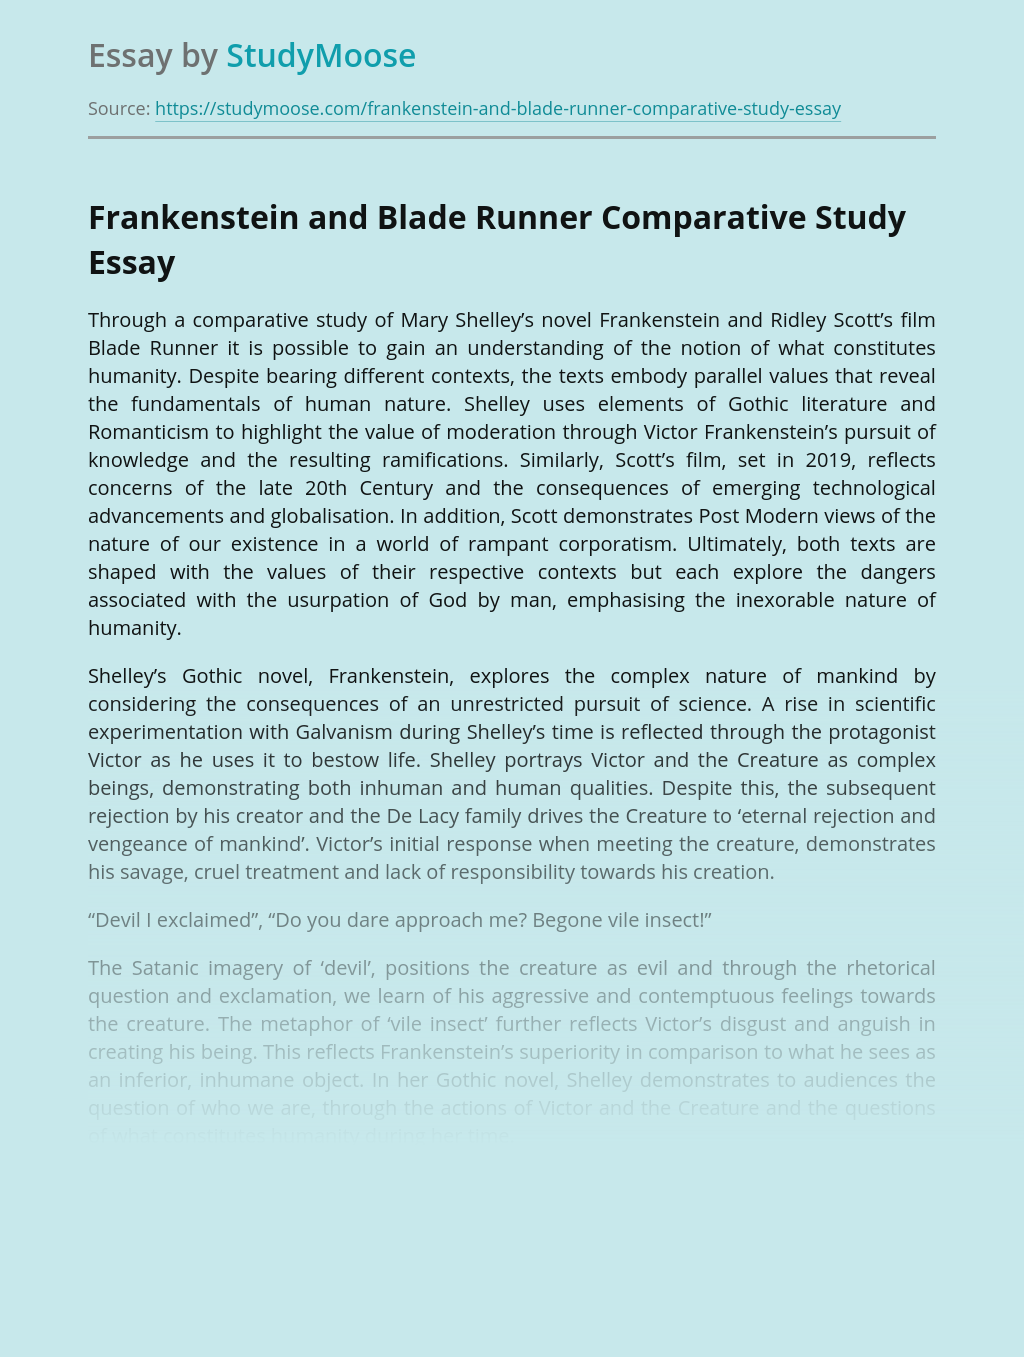 Frankenstein and Blade Runner Comparative Study